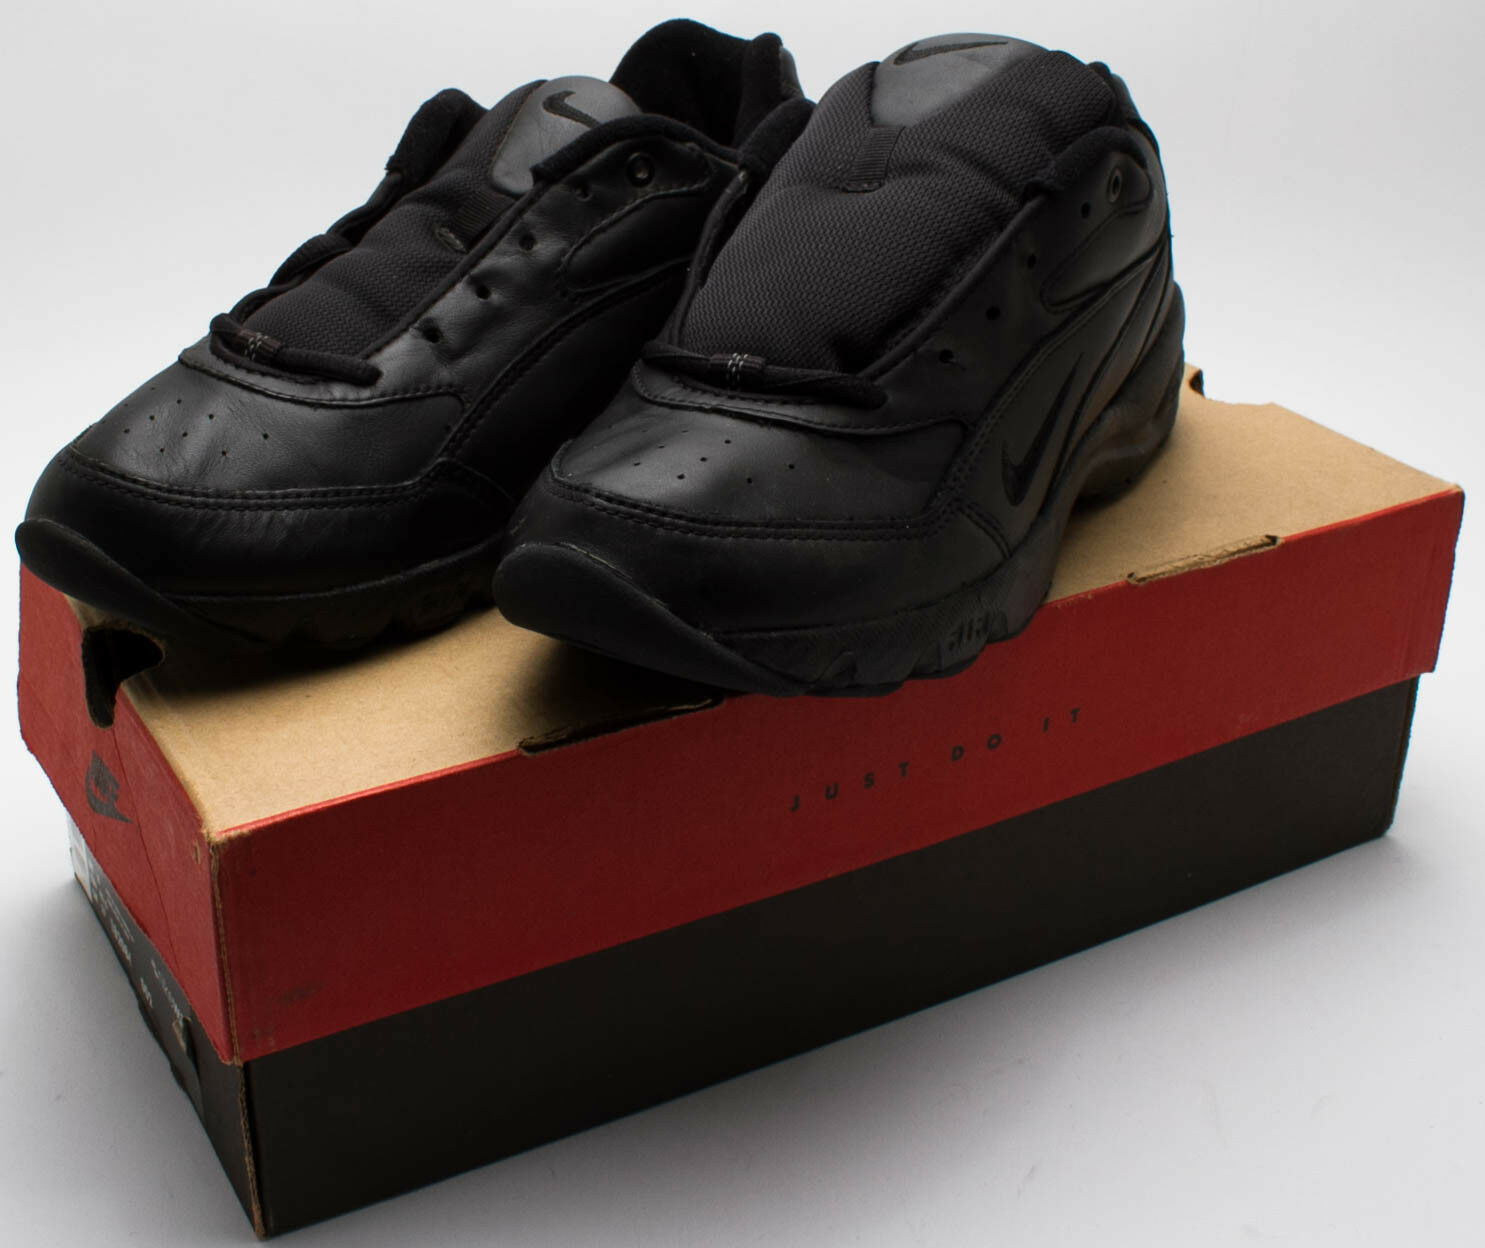 Nike Hommes OG Vintage 1999 Air Quintessential II Noir Noir 182084-002 SZ